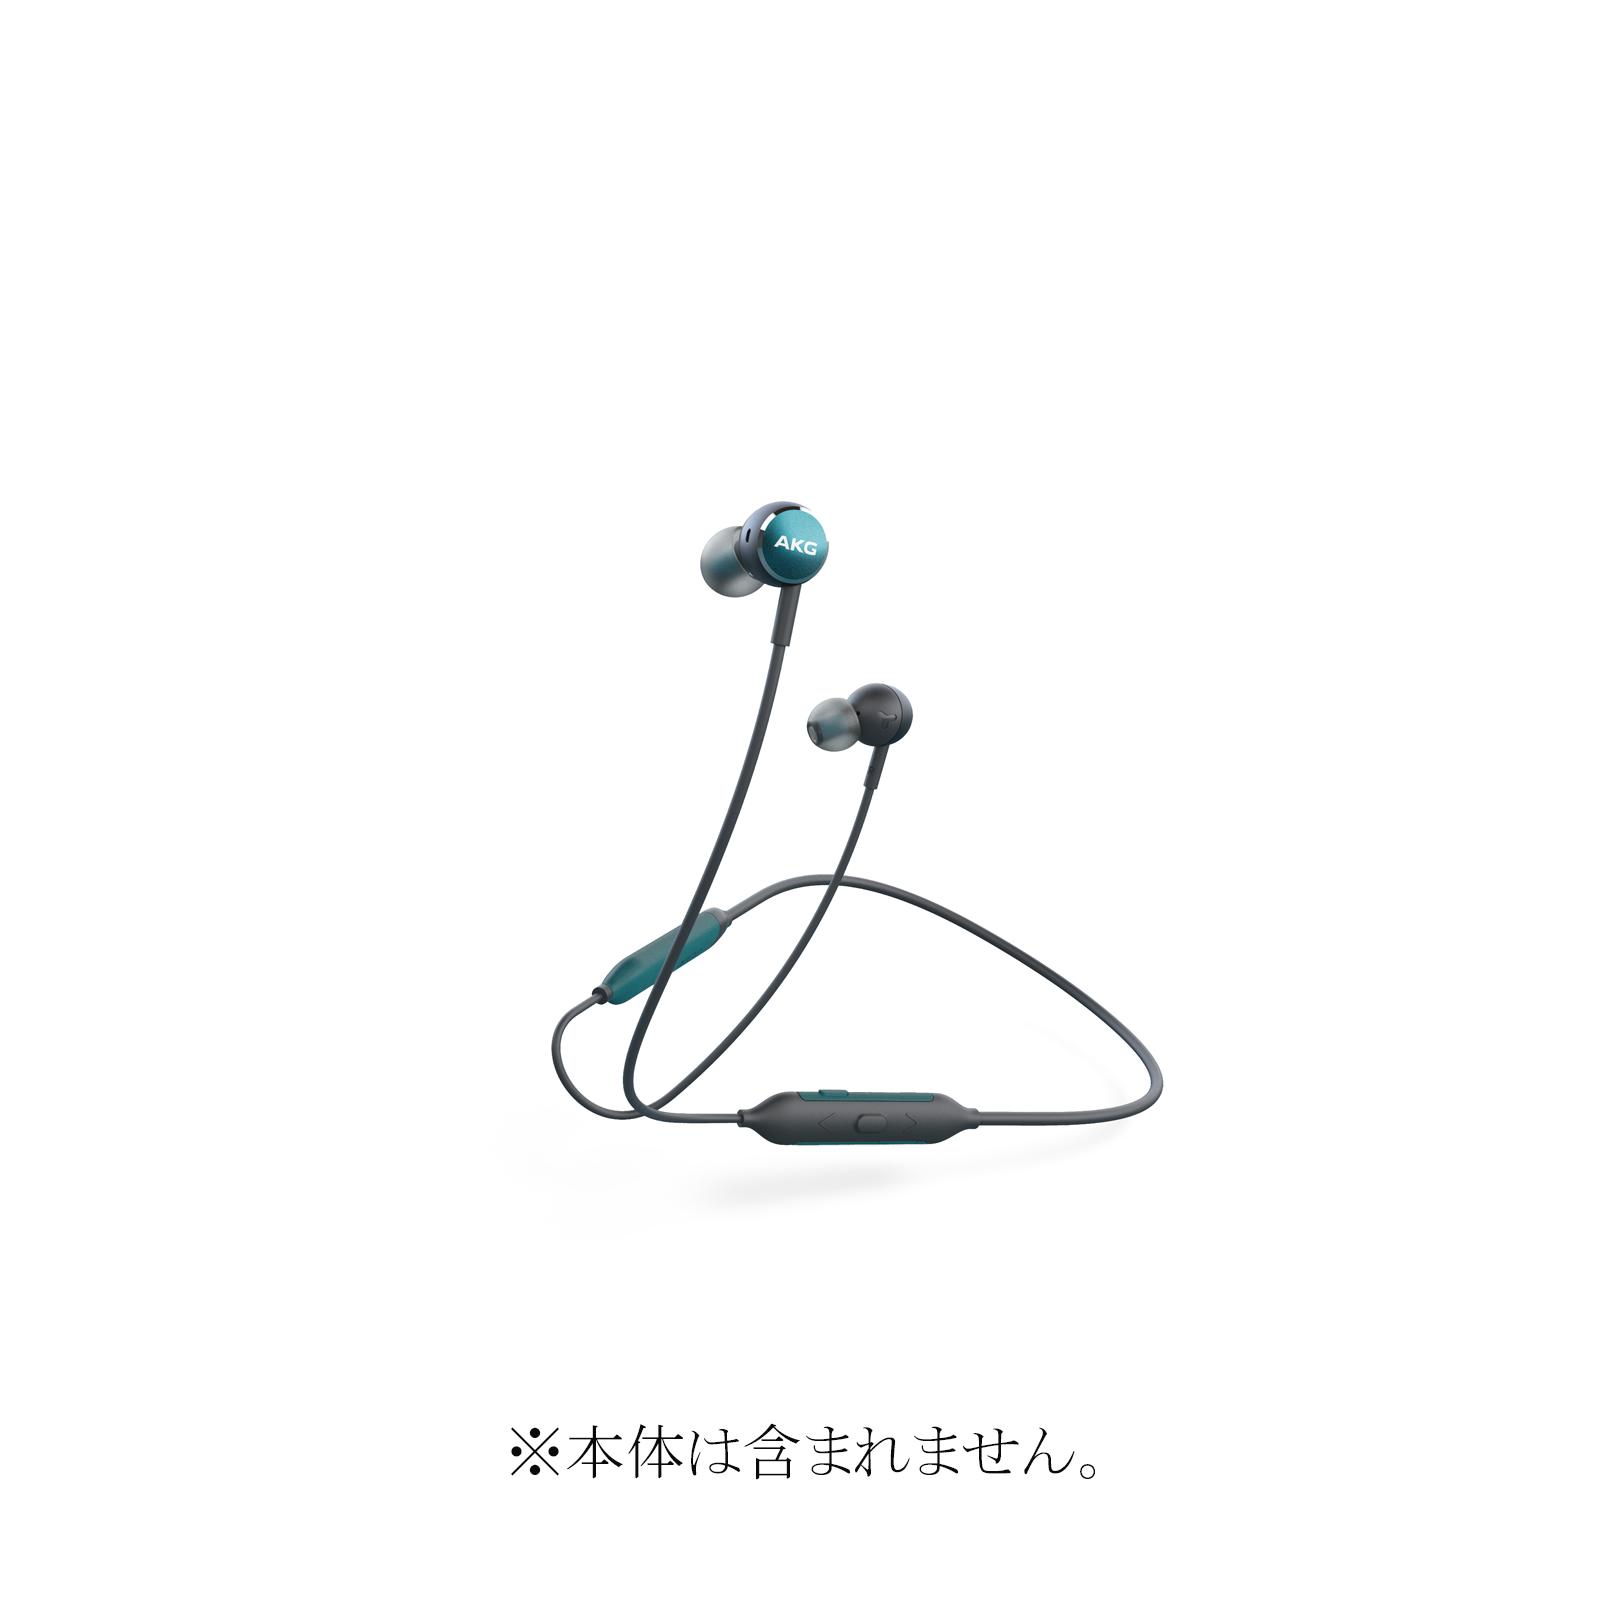 AKG Y100BT EAR TIPS - Green - Hero